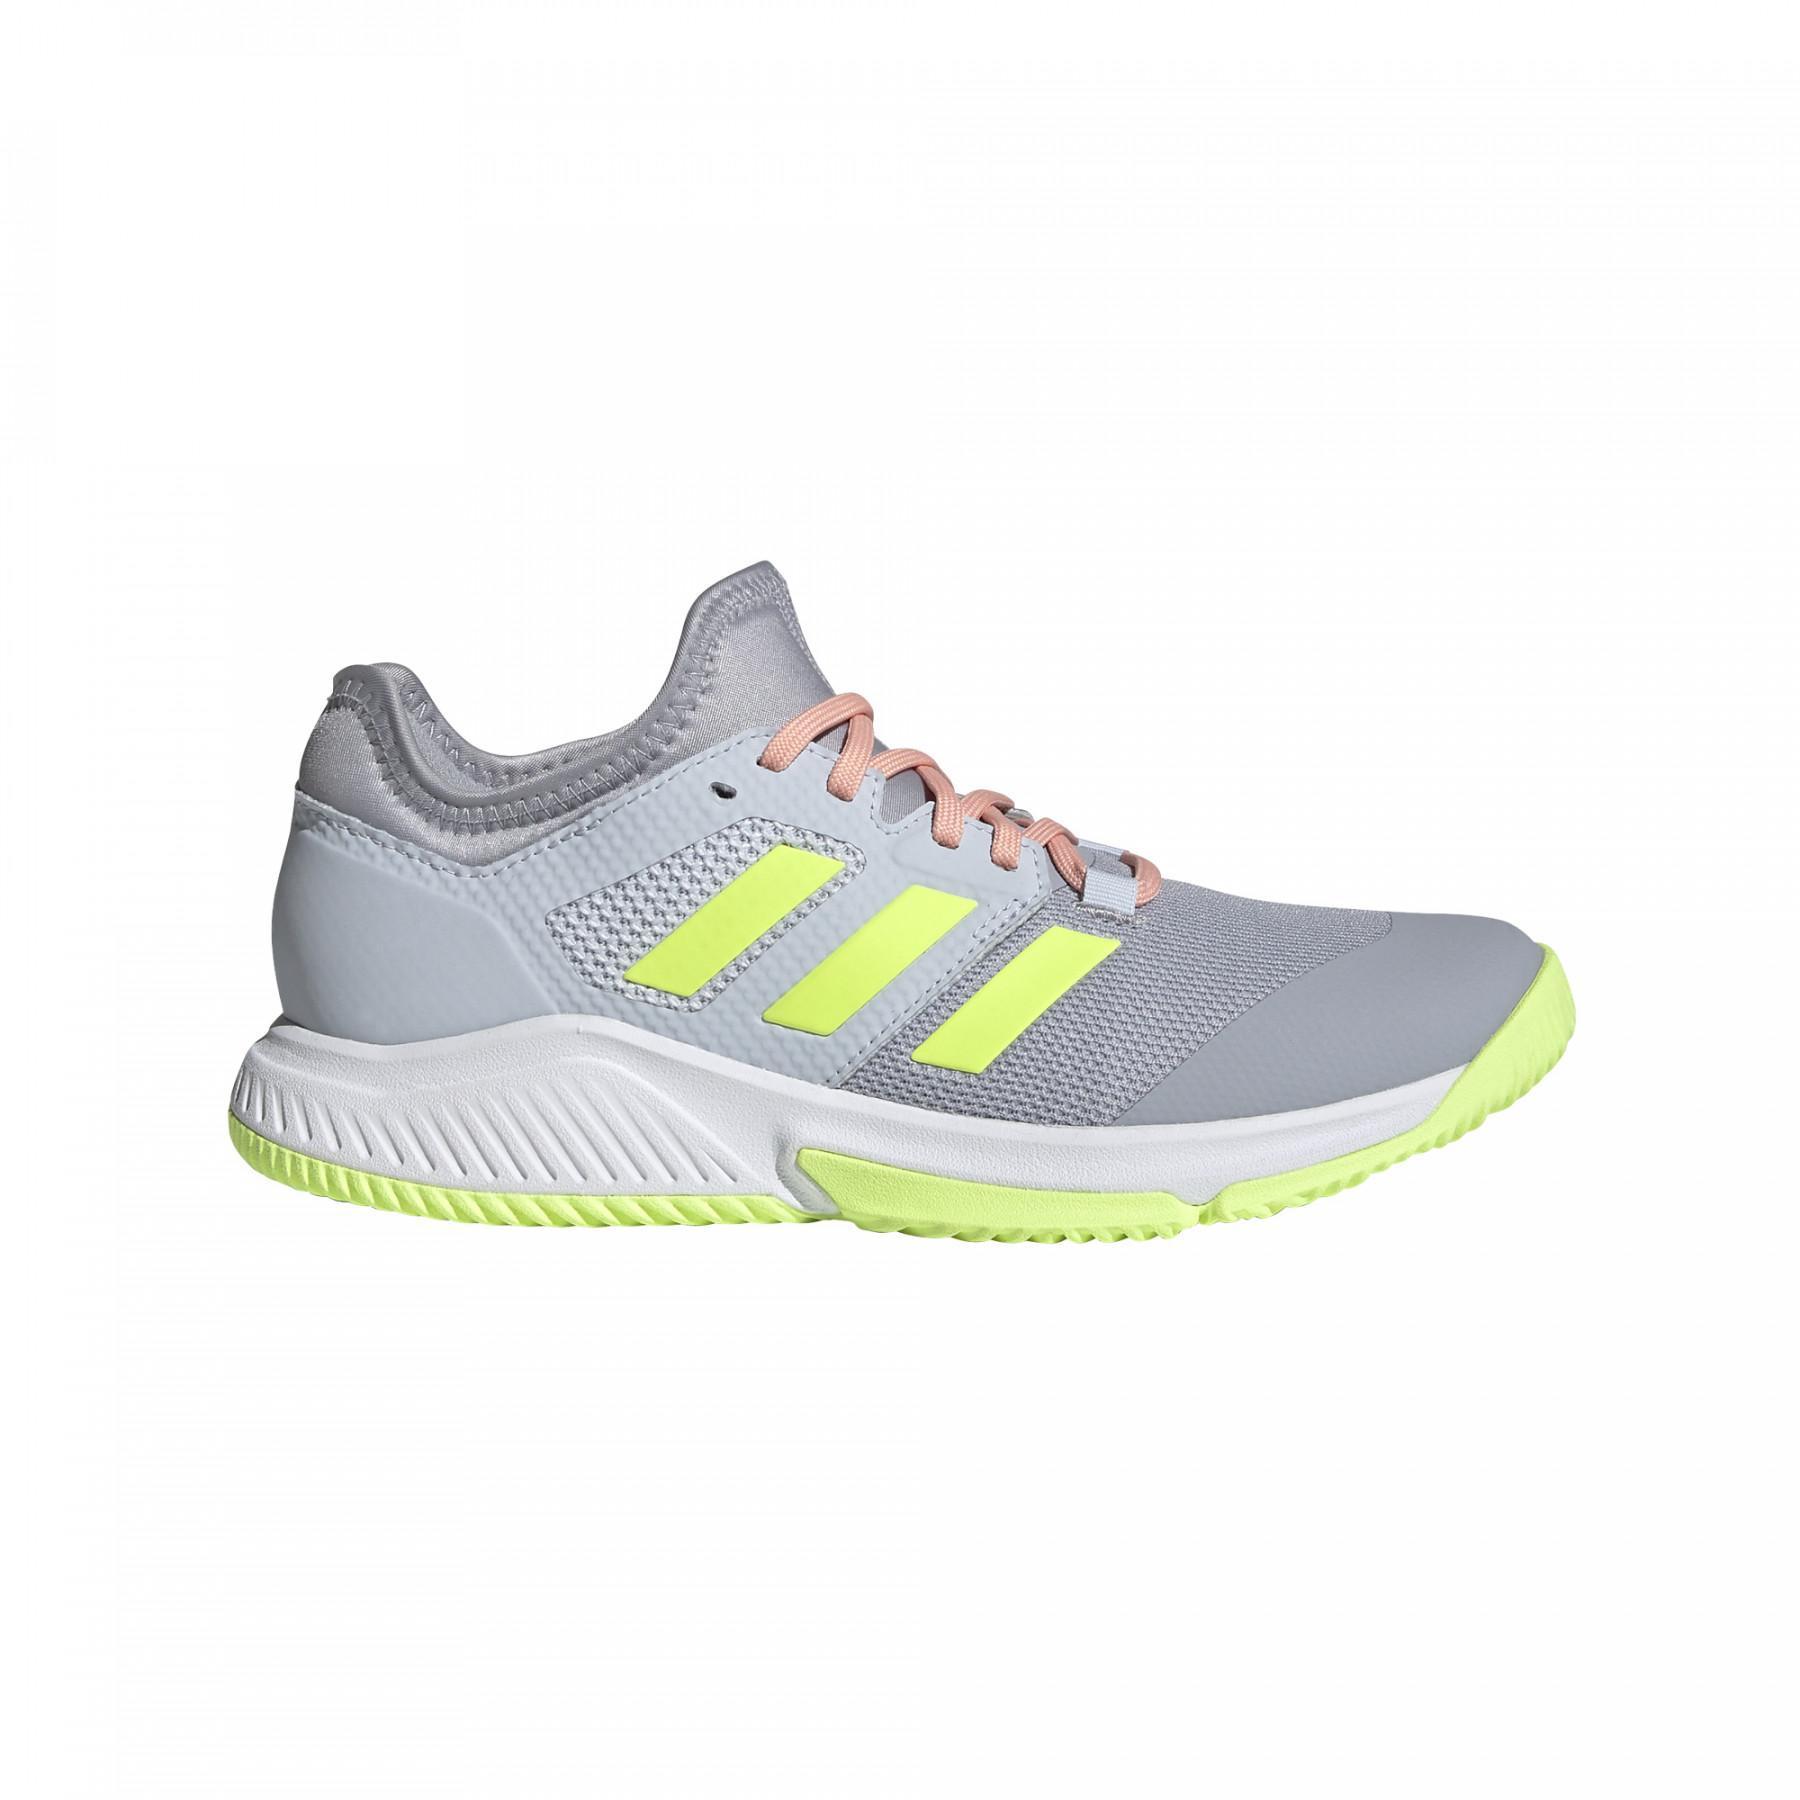 Chaussures femme adidas Court Team Bounce